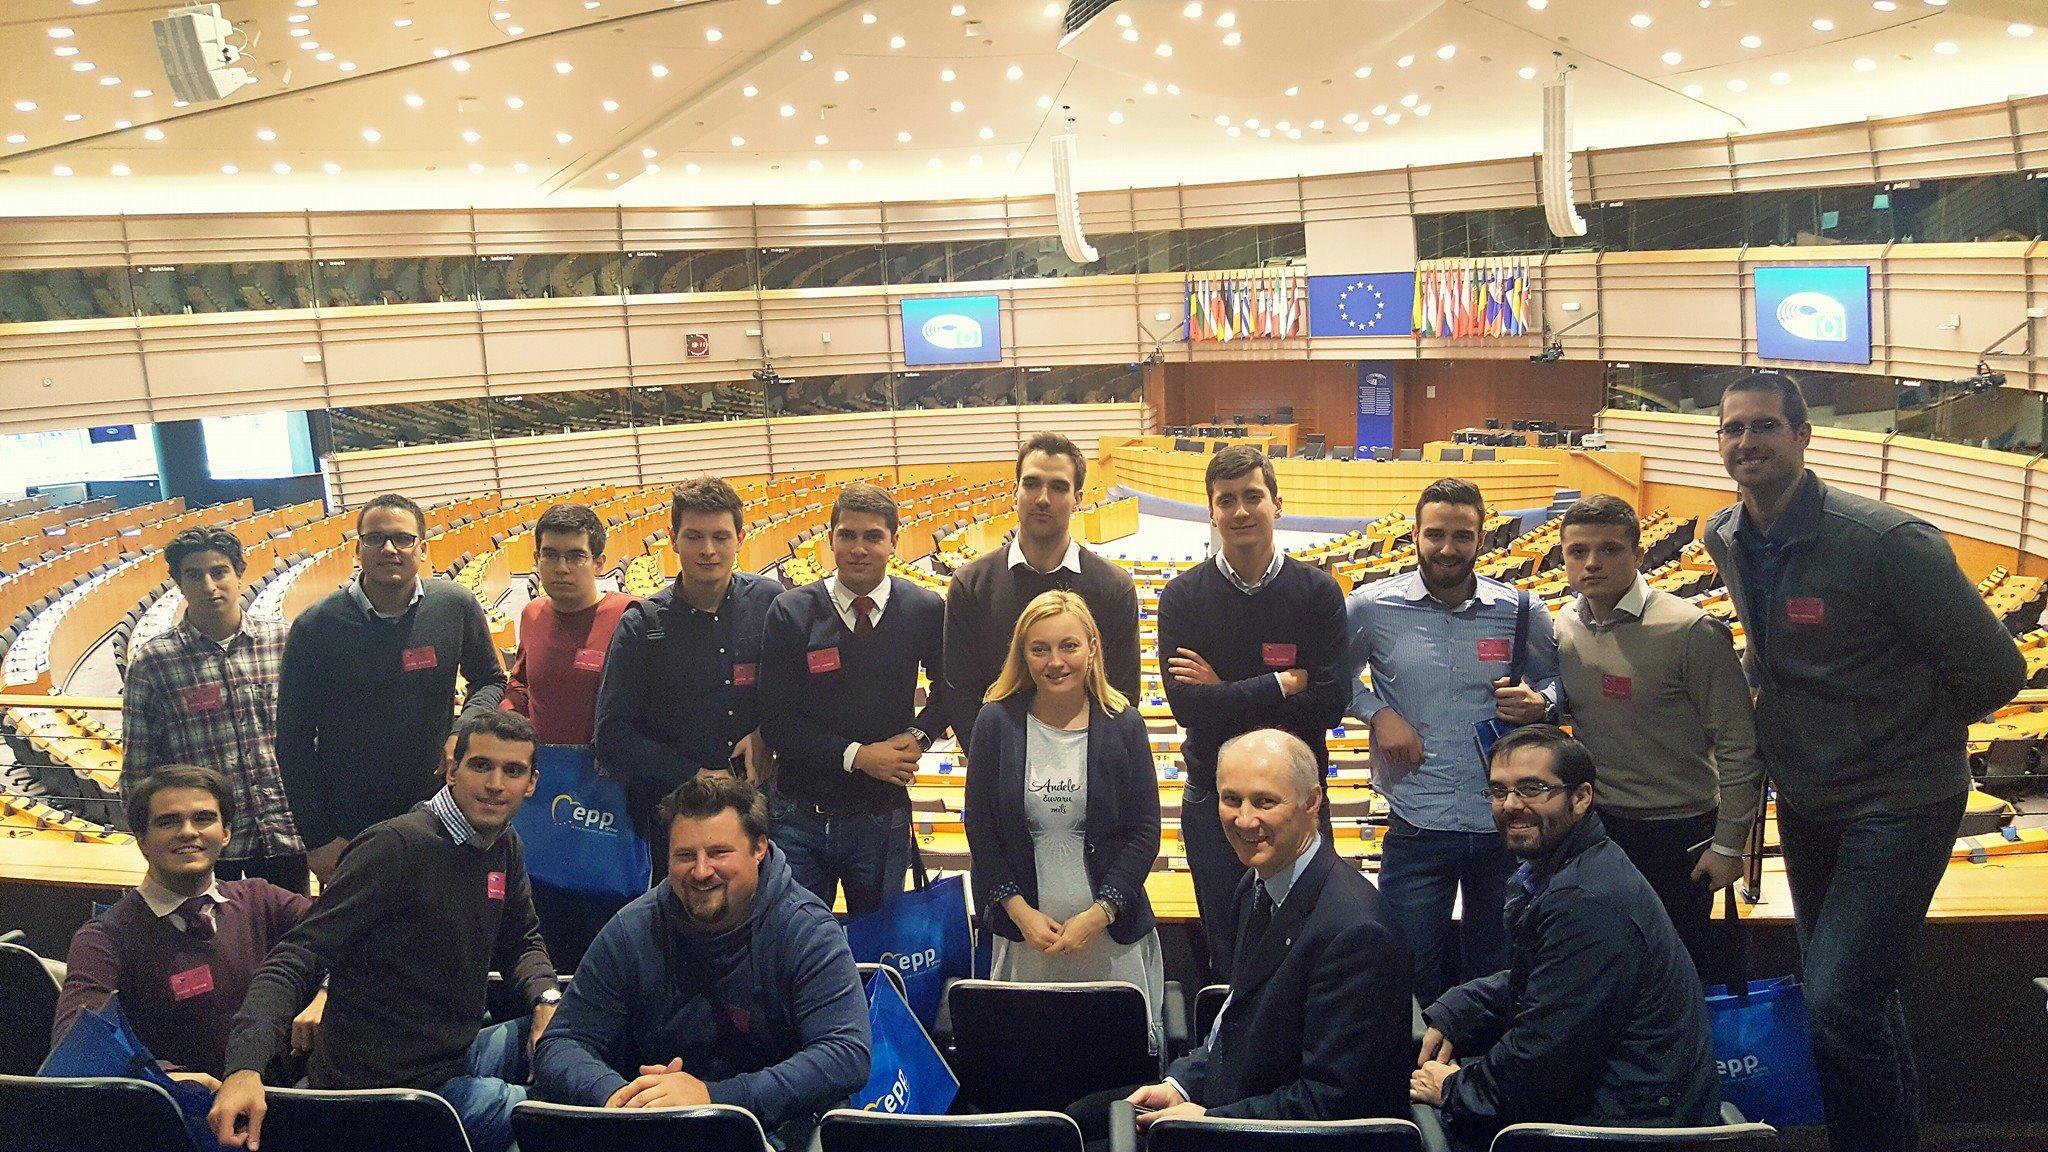 Sveučilišni klub Gradec u posjetu Europskom parlamentu u Bruxellesu